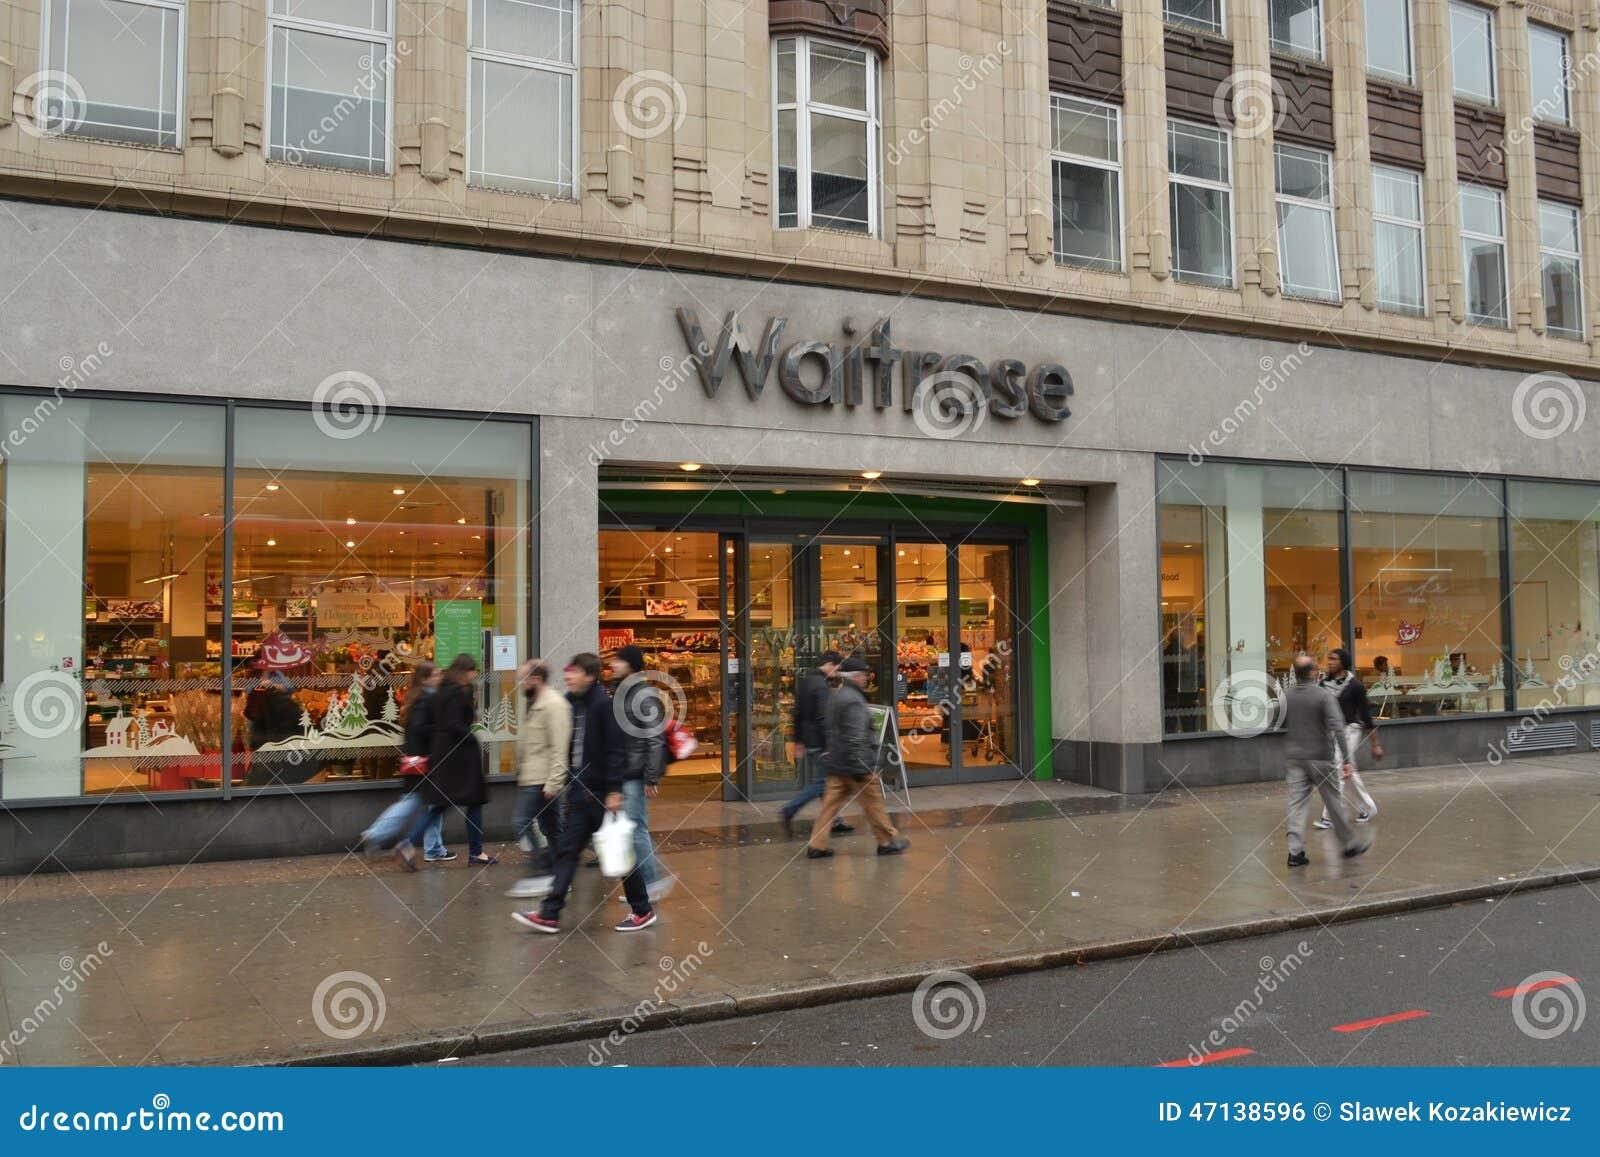 Waitrose Store London Editorial Photo Image Of John 47138596